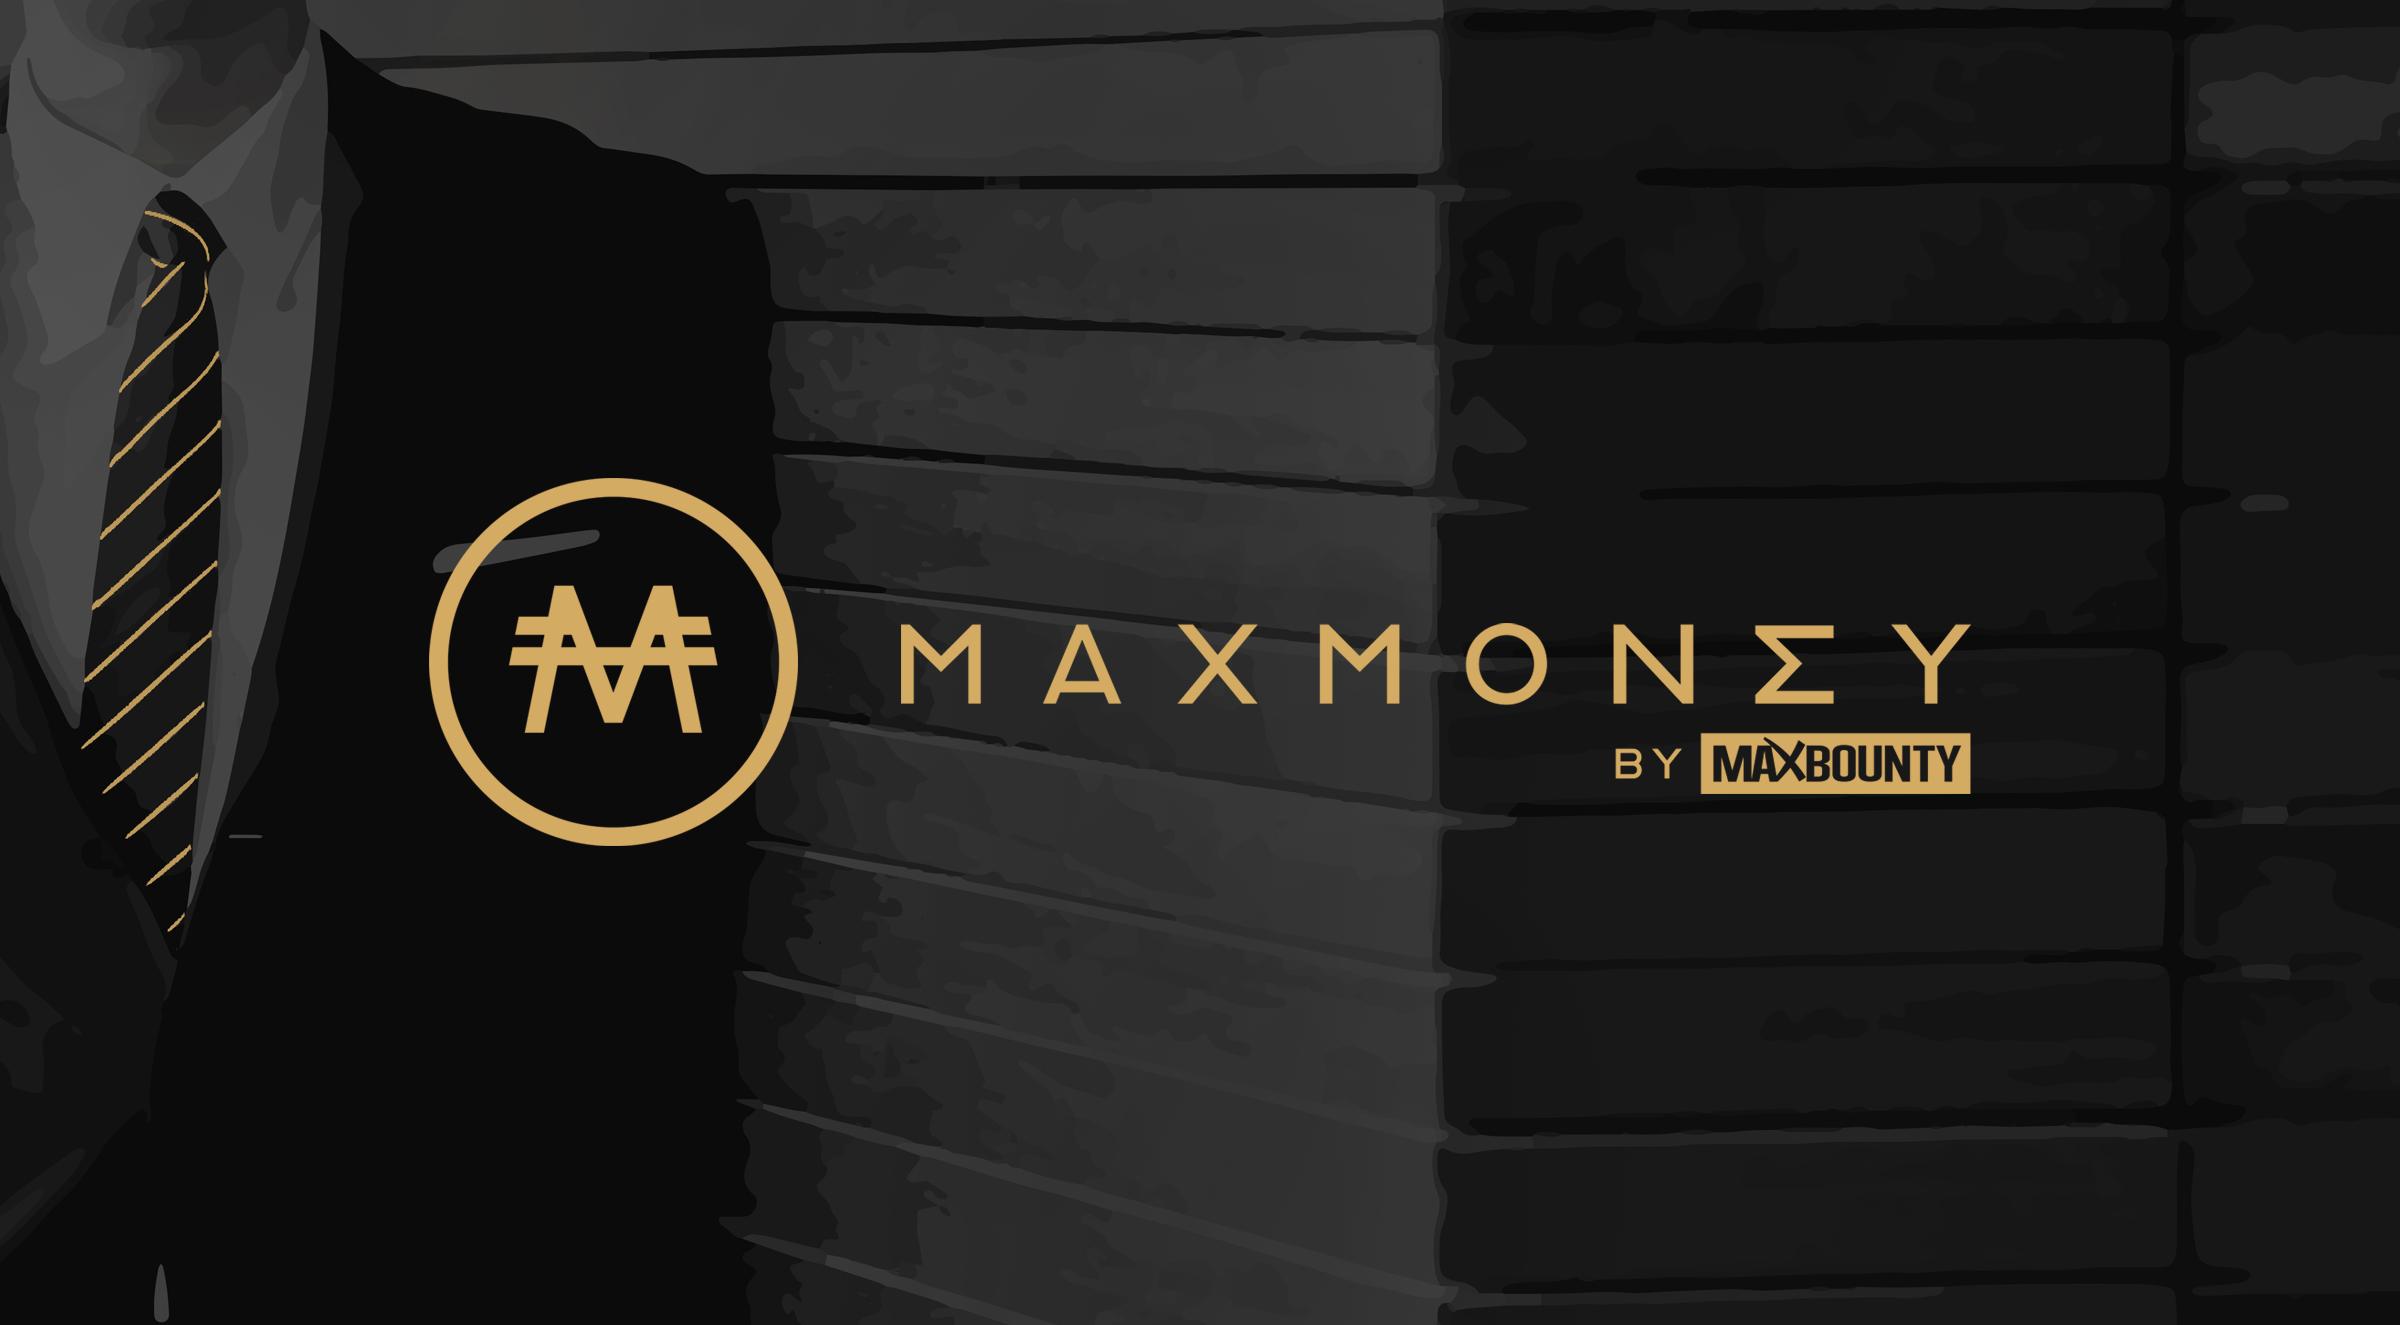 Earn More on Every Dollar with MaxBounty's MaxMoney Rewards Program